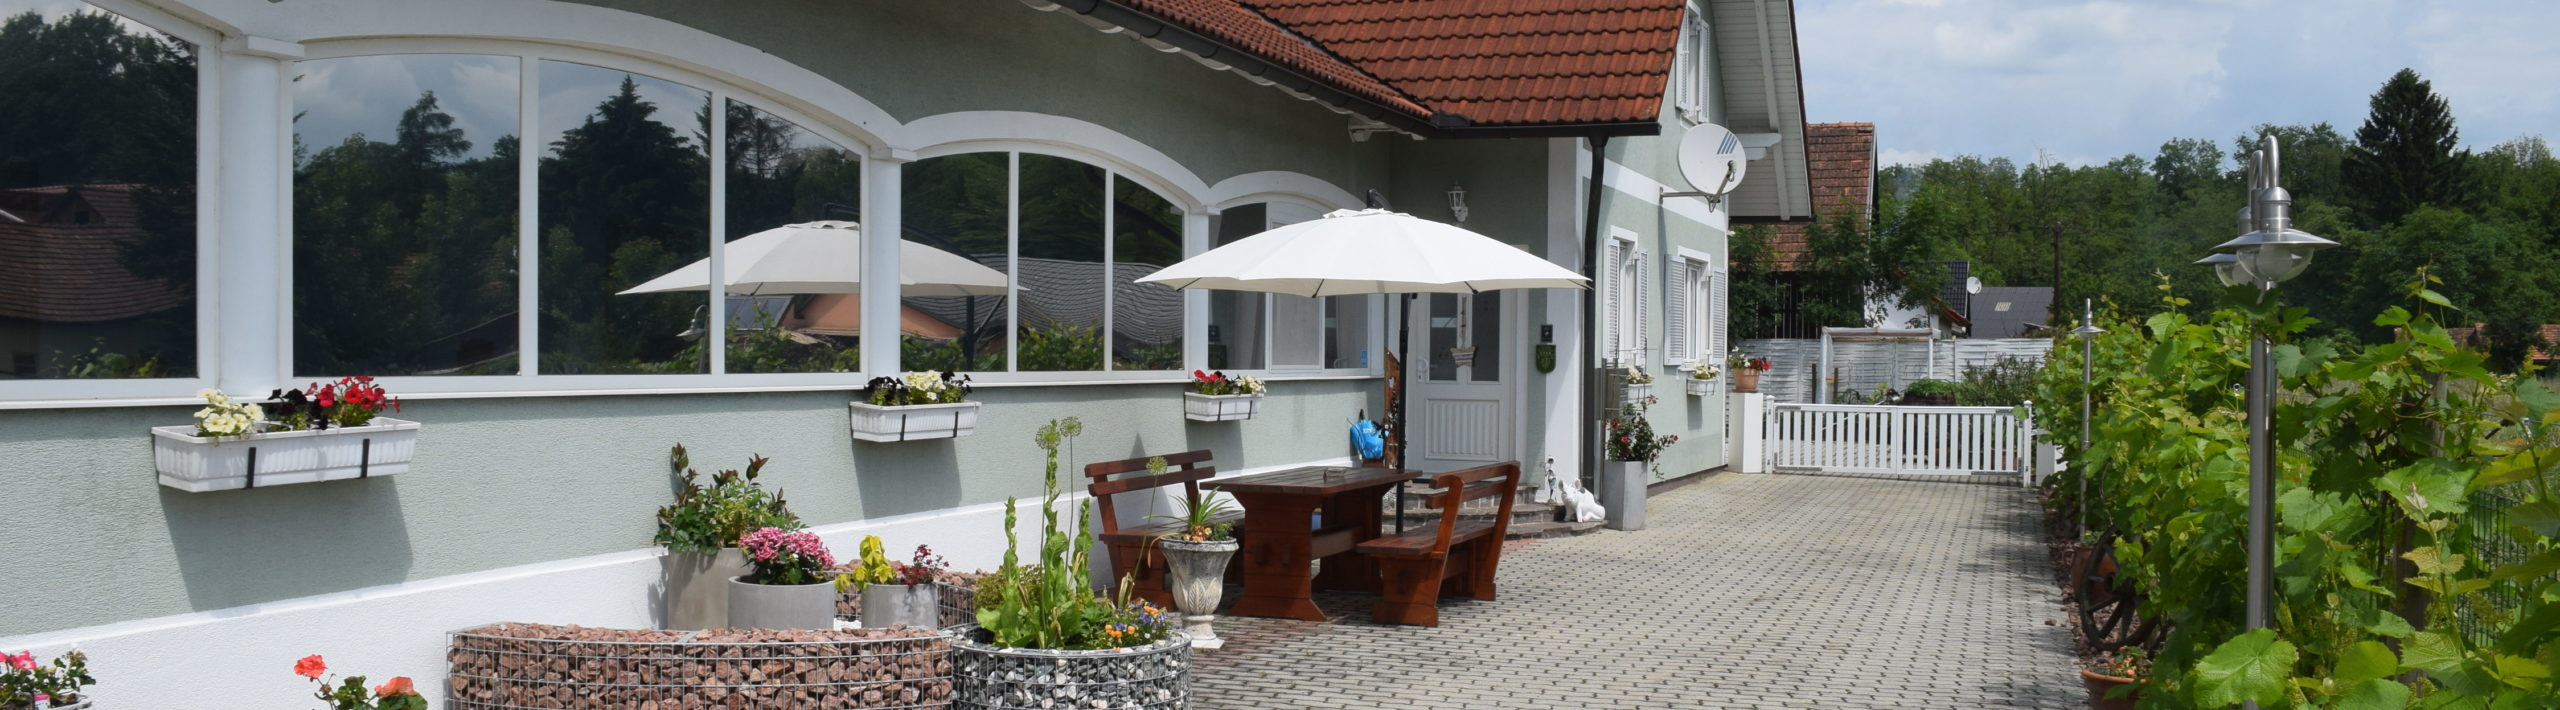 Gästehaus Sabina